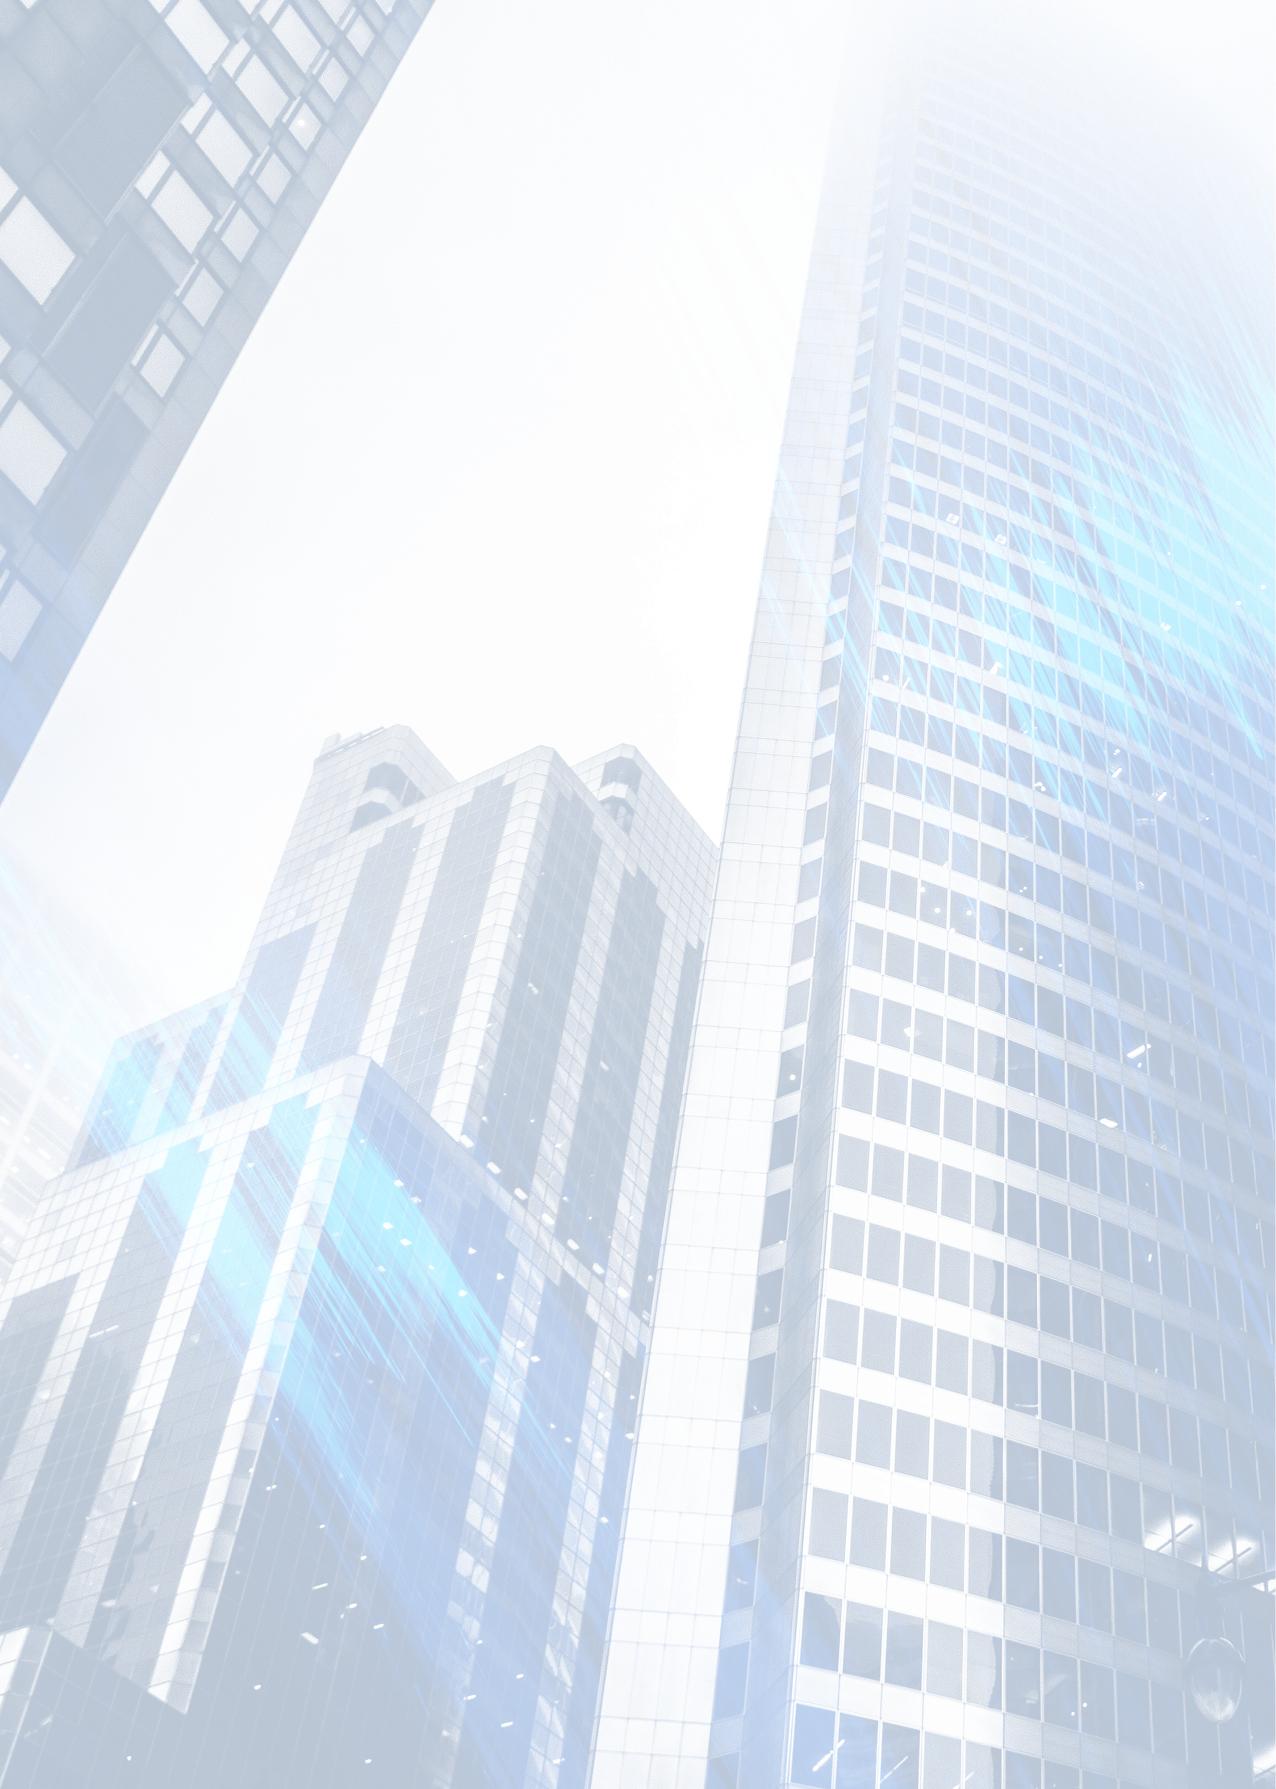 Market Dynamics: Professional Services